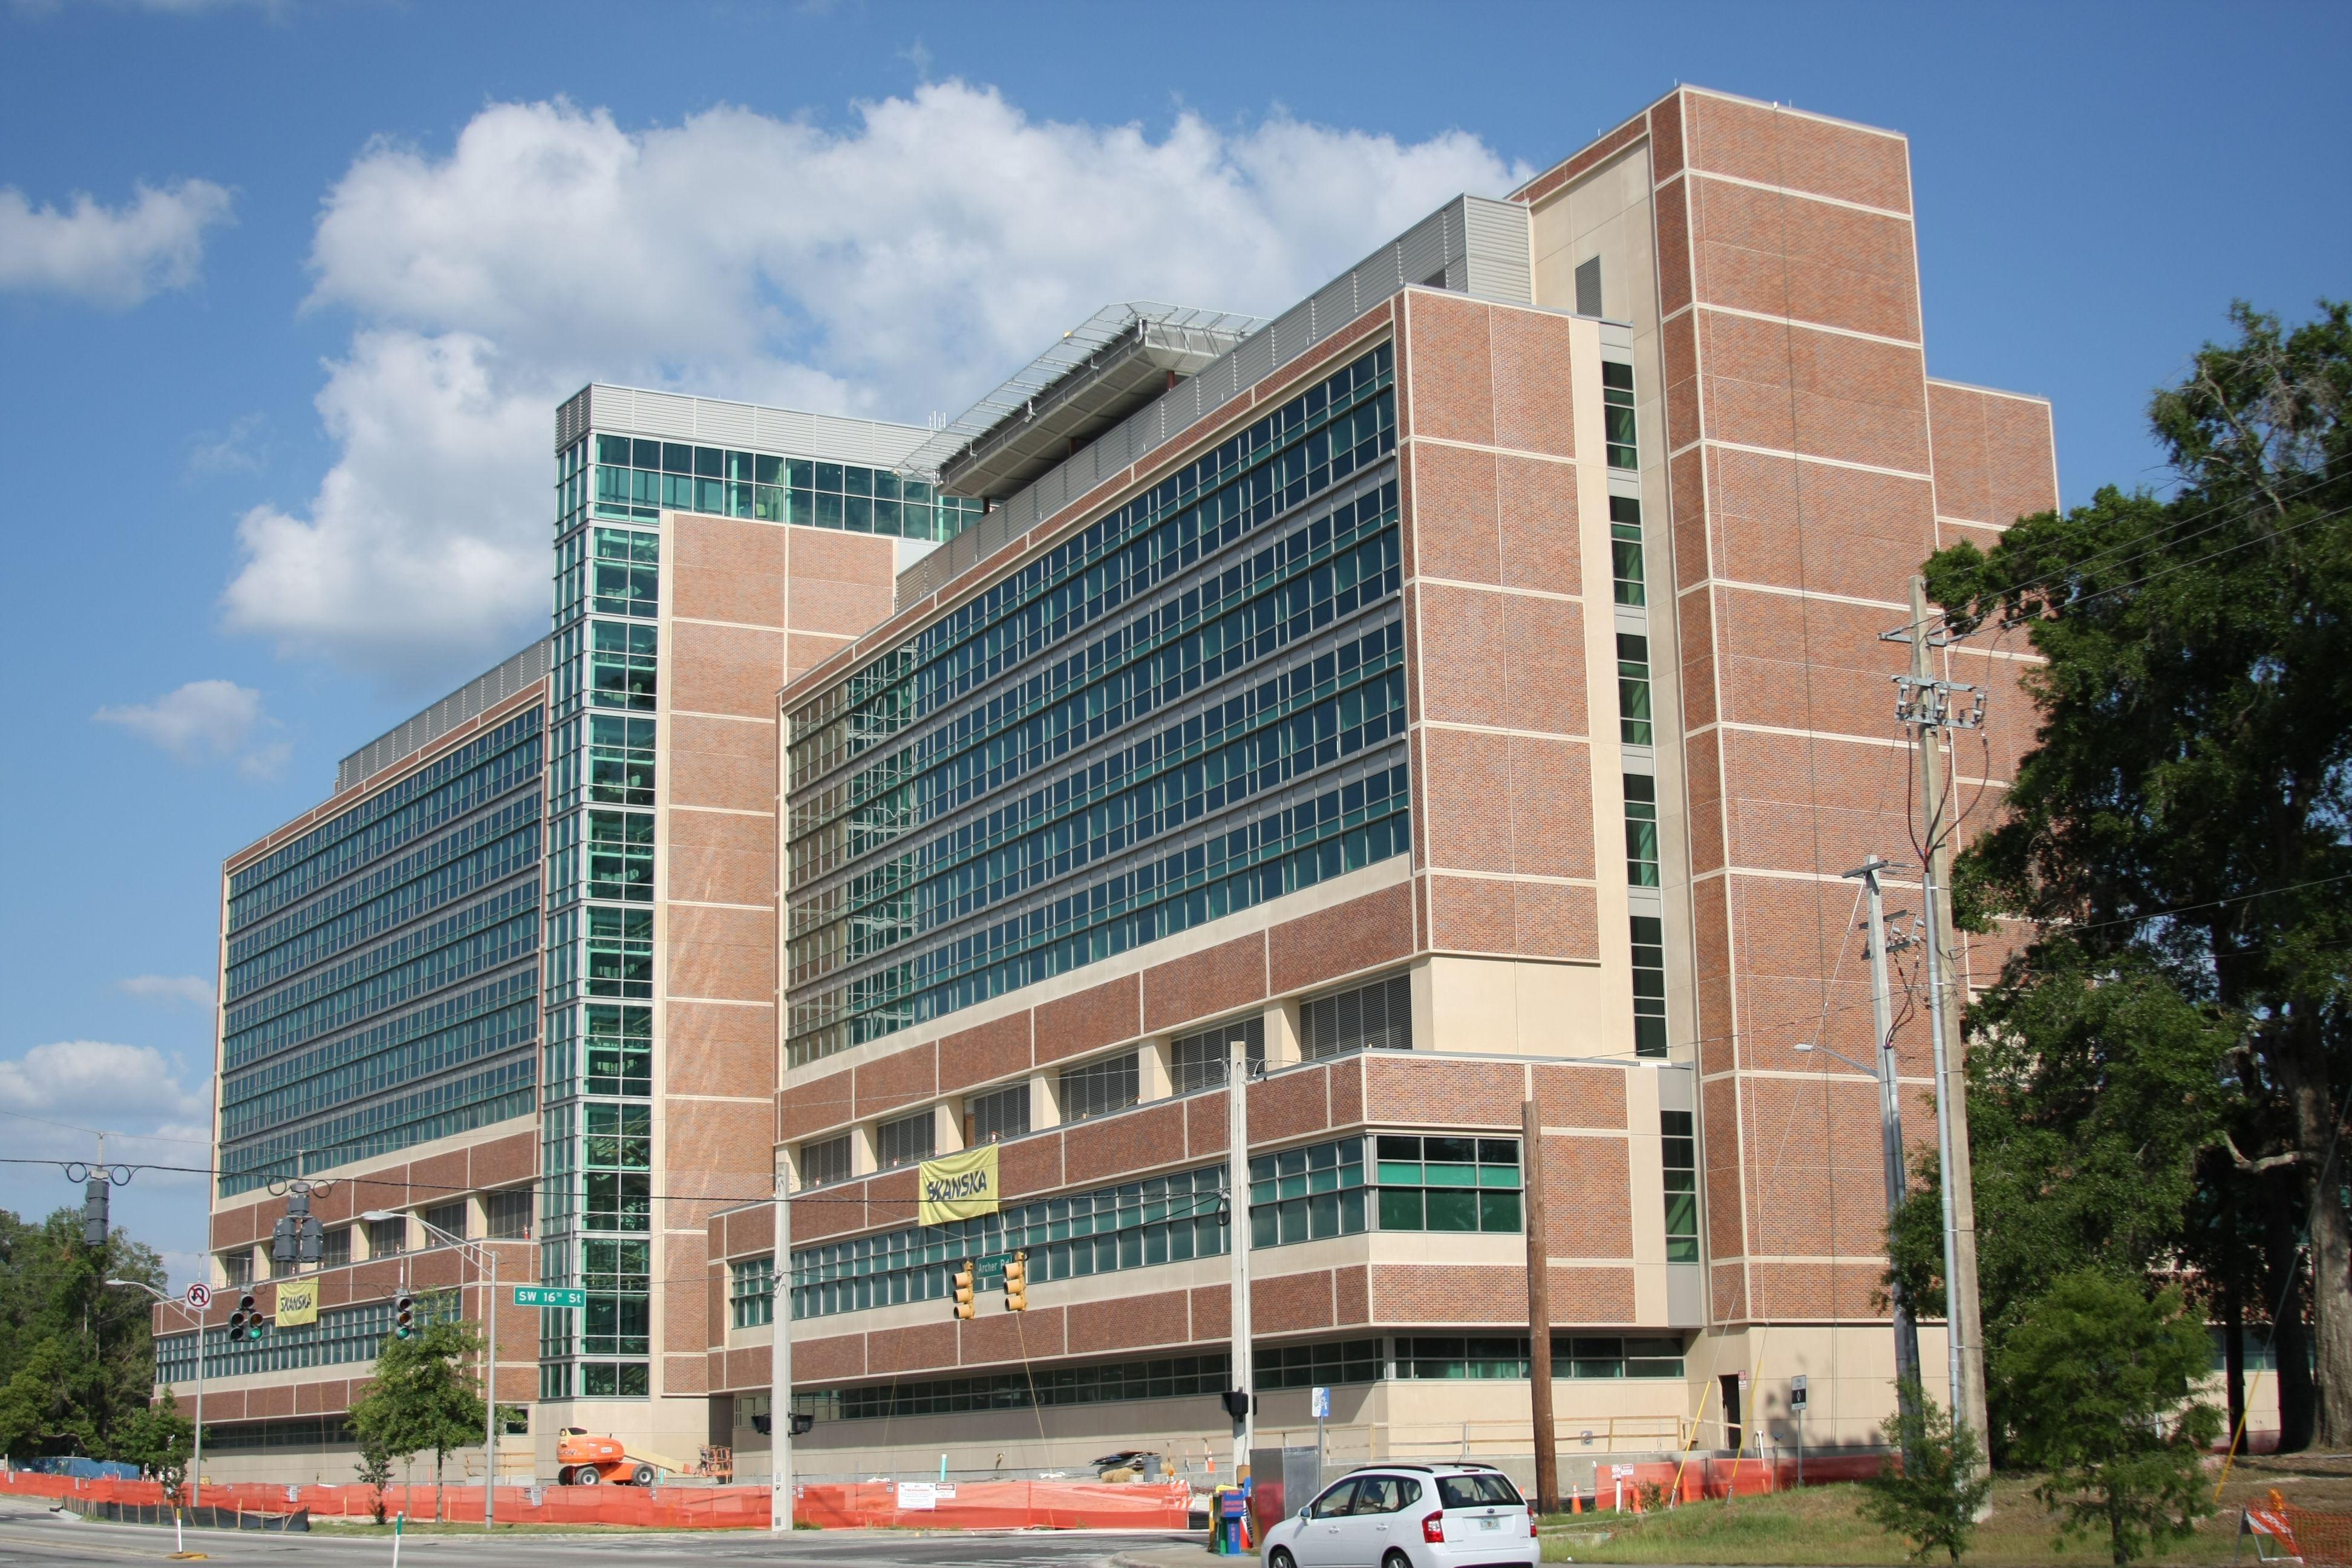 University of Florida Cancer Center